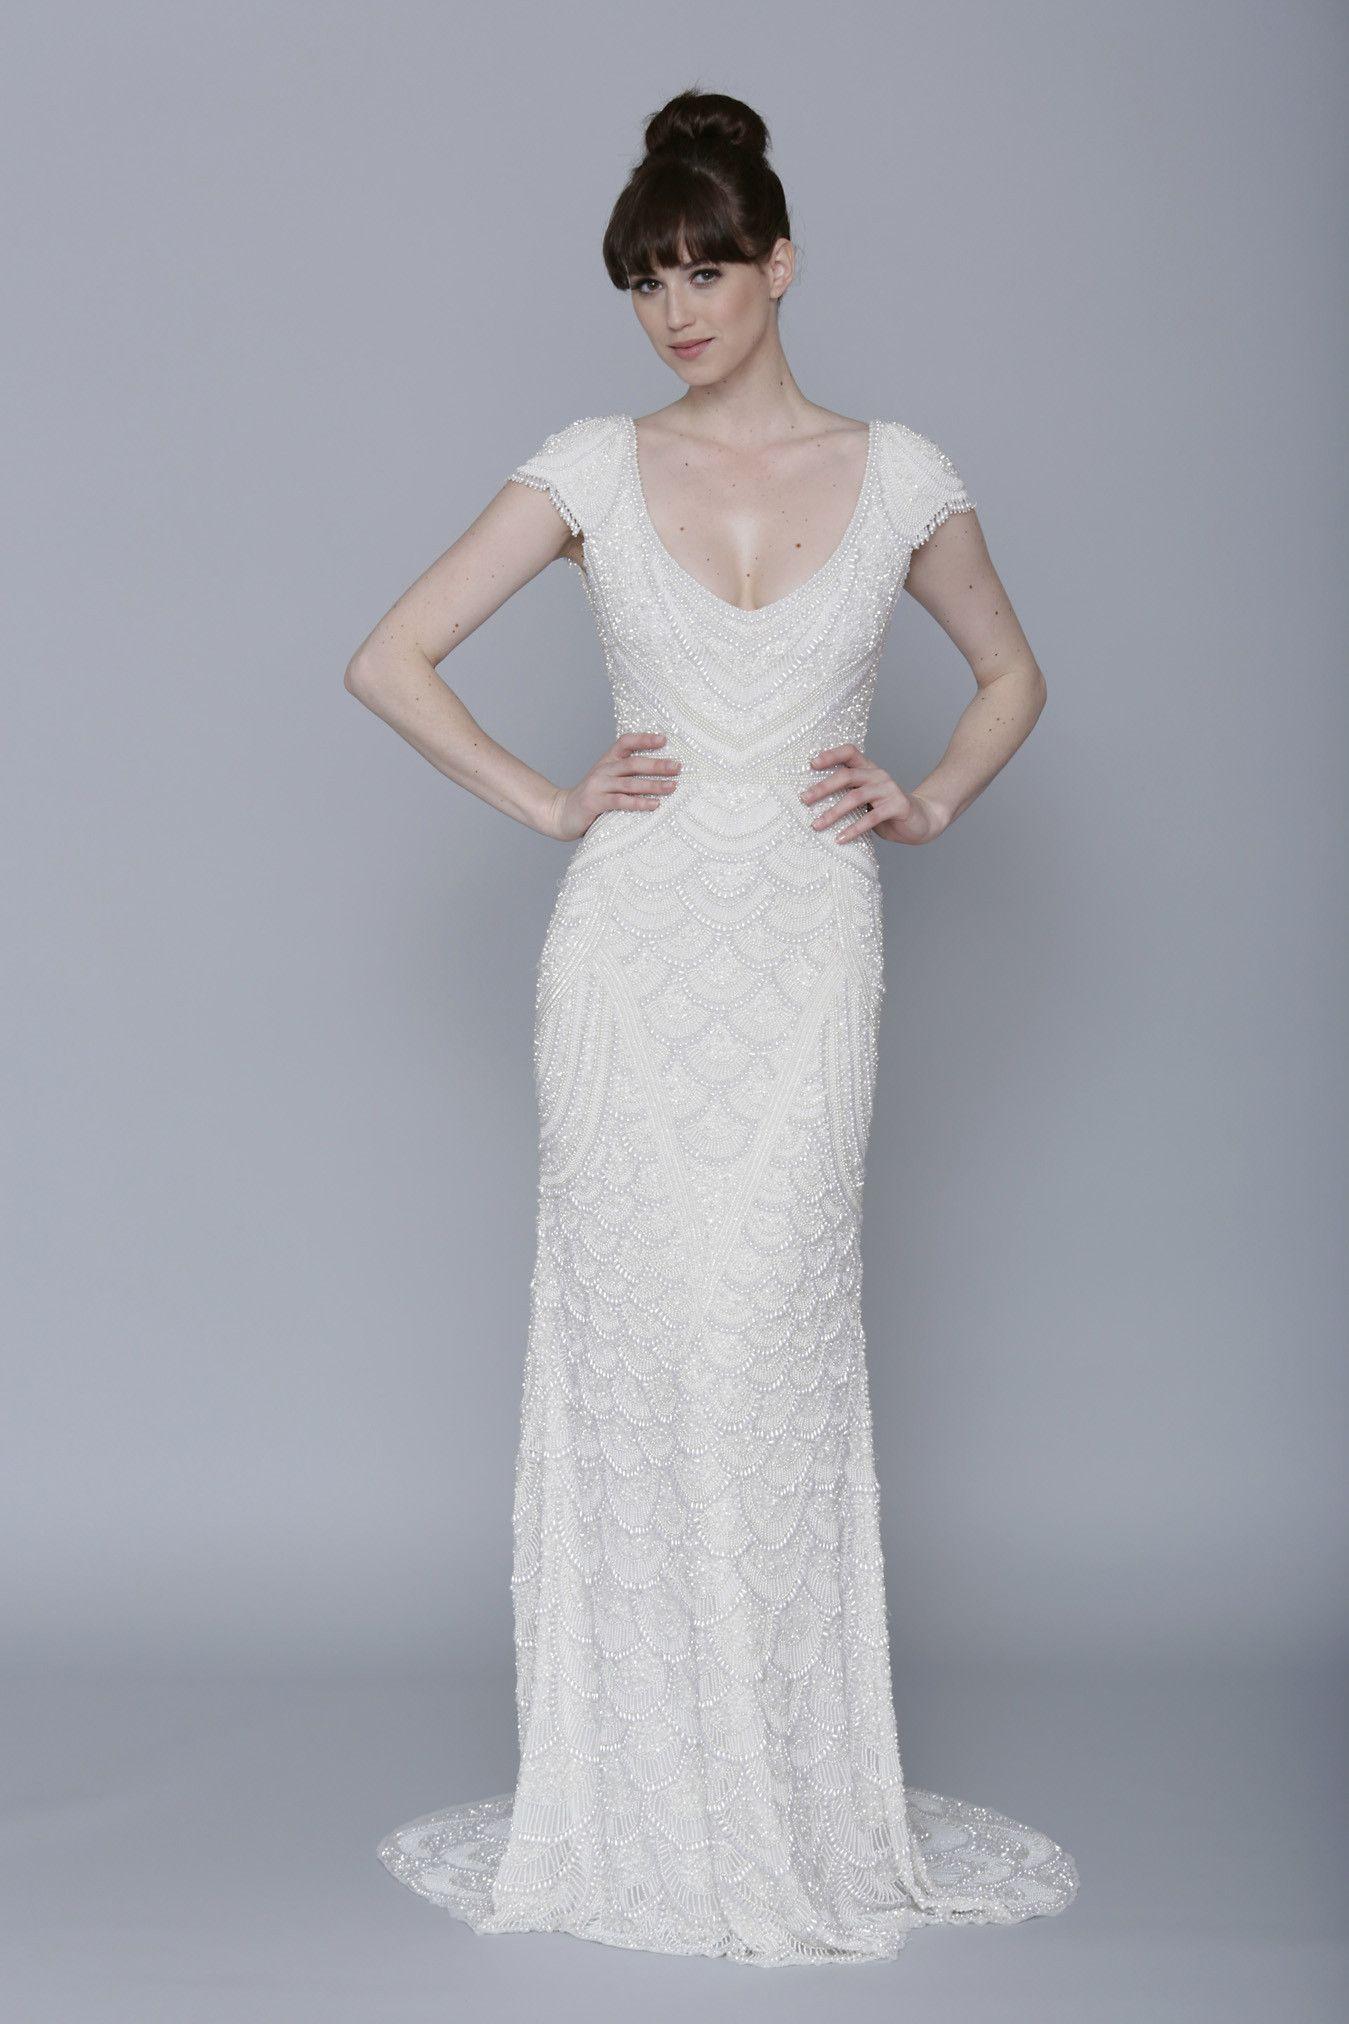 Weekly Favourite Wedding Dress by Theia  Wedding Board